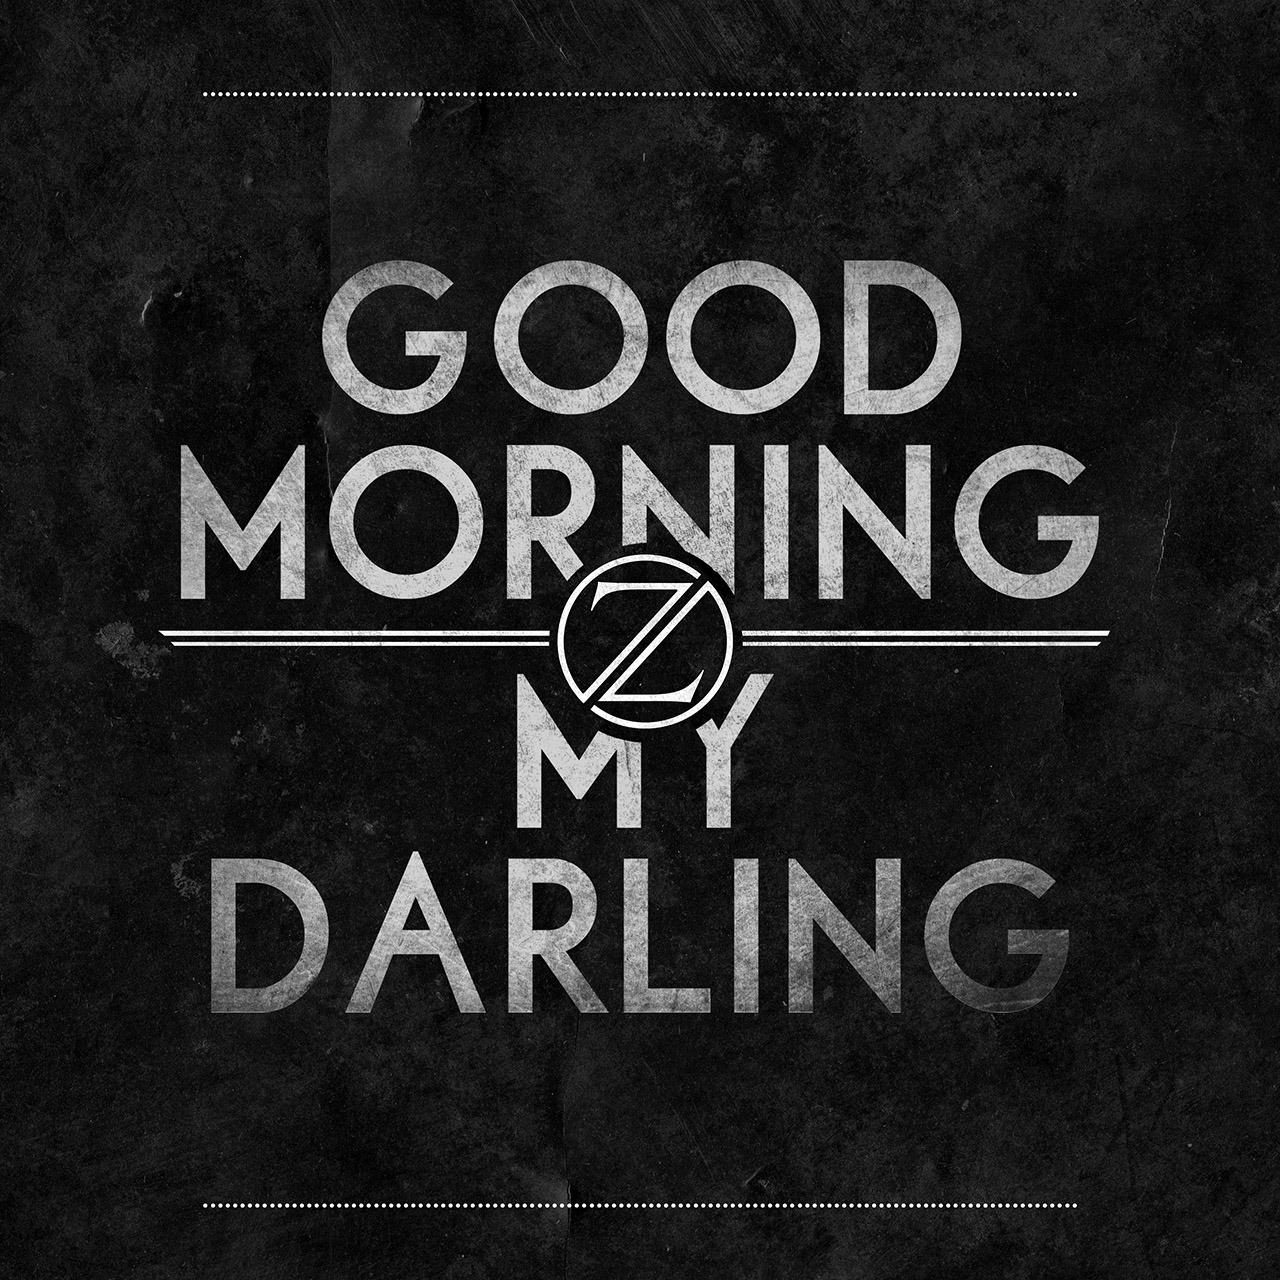 Zelimir - GMMD Wallpaper (Good Morning My Darling) (Good Morning My Darling)